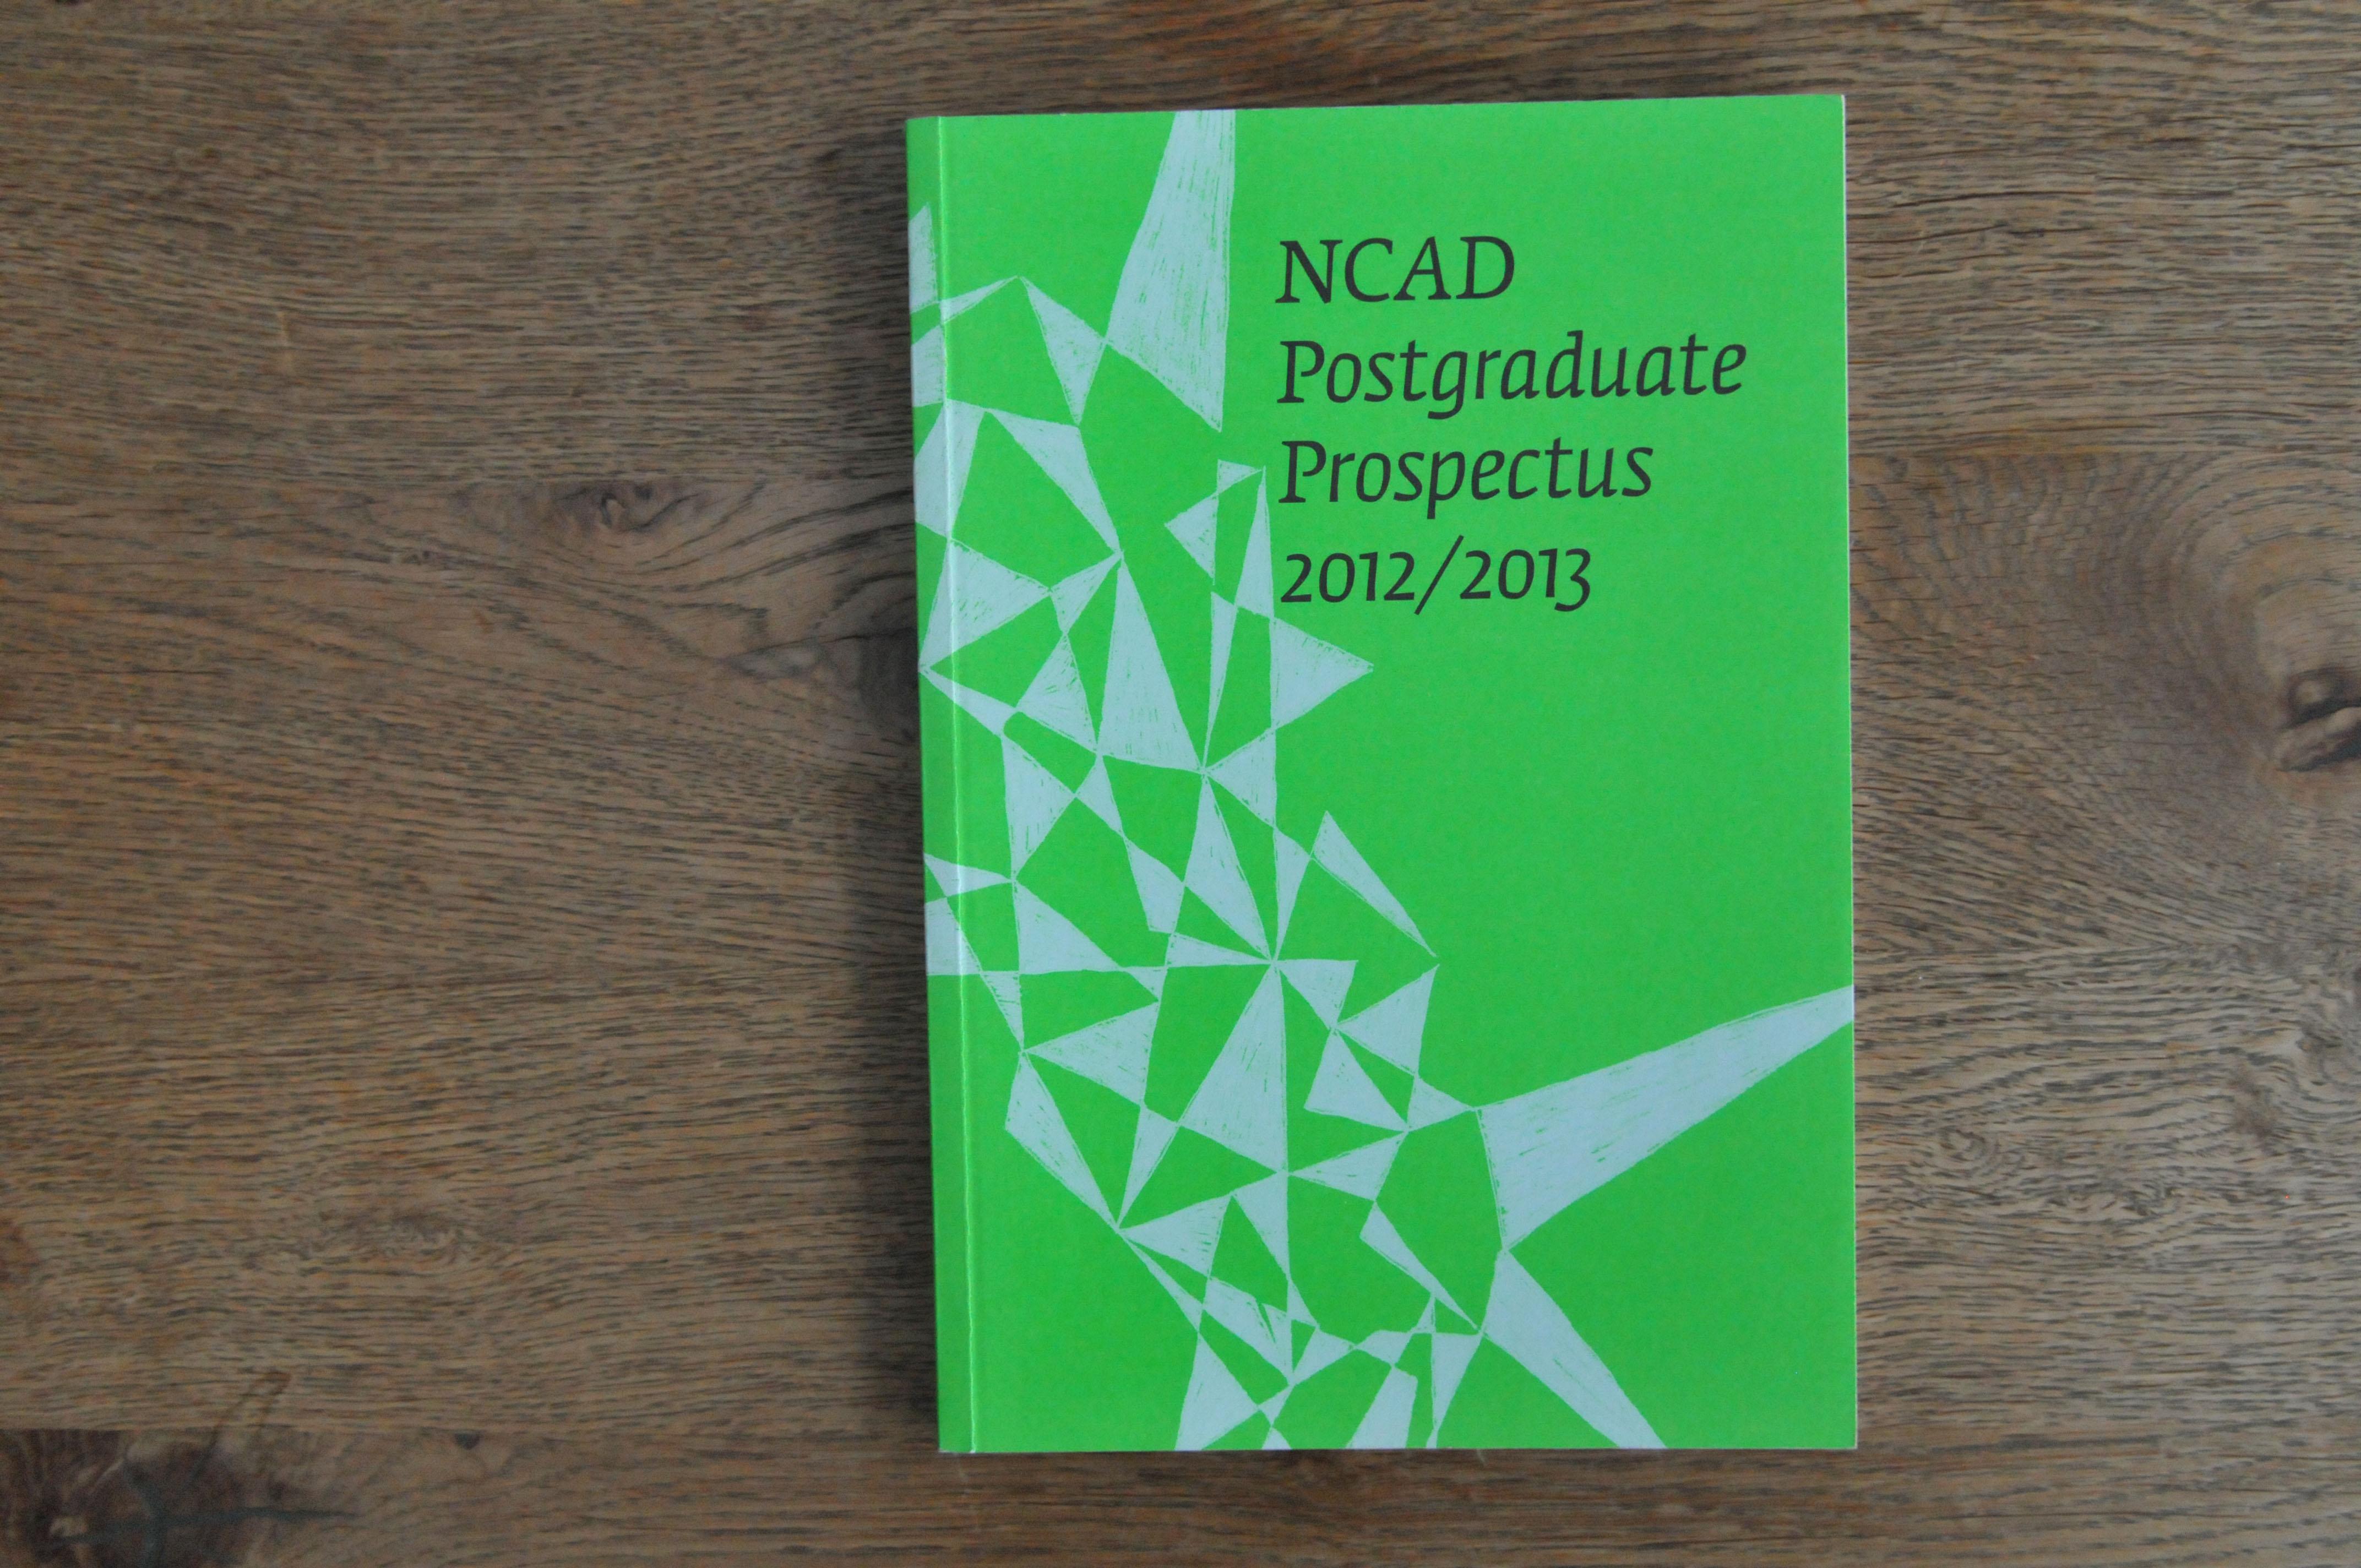 Cover image: NCAD Postgraduate Prospectus 2012/2013